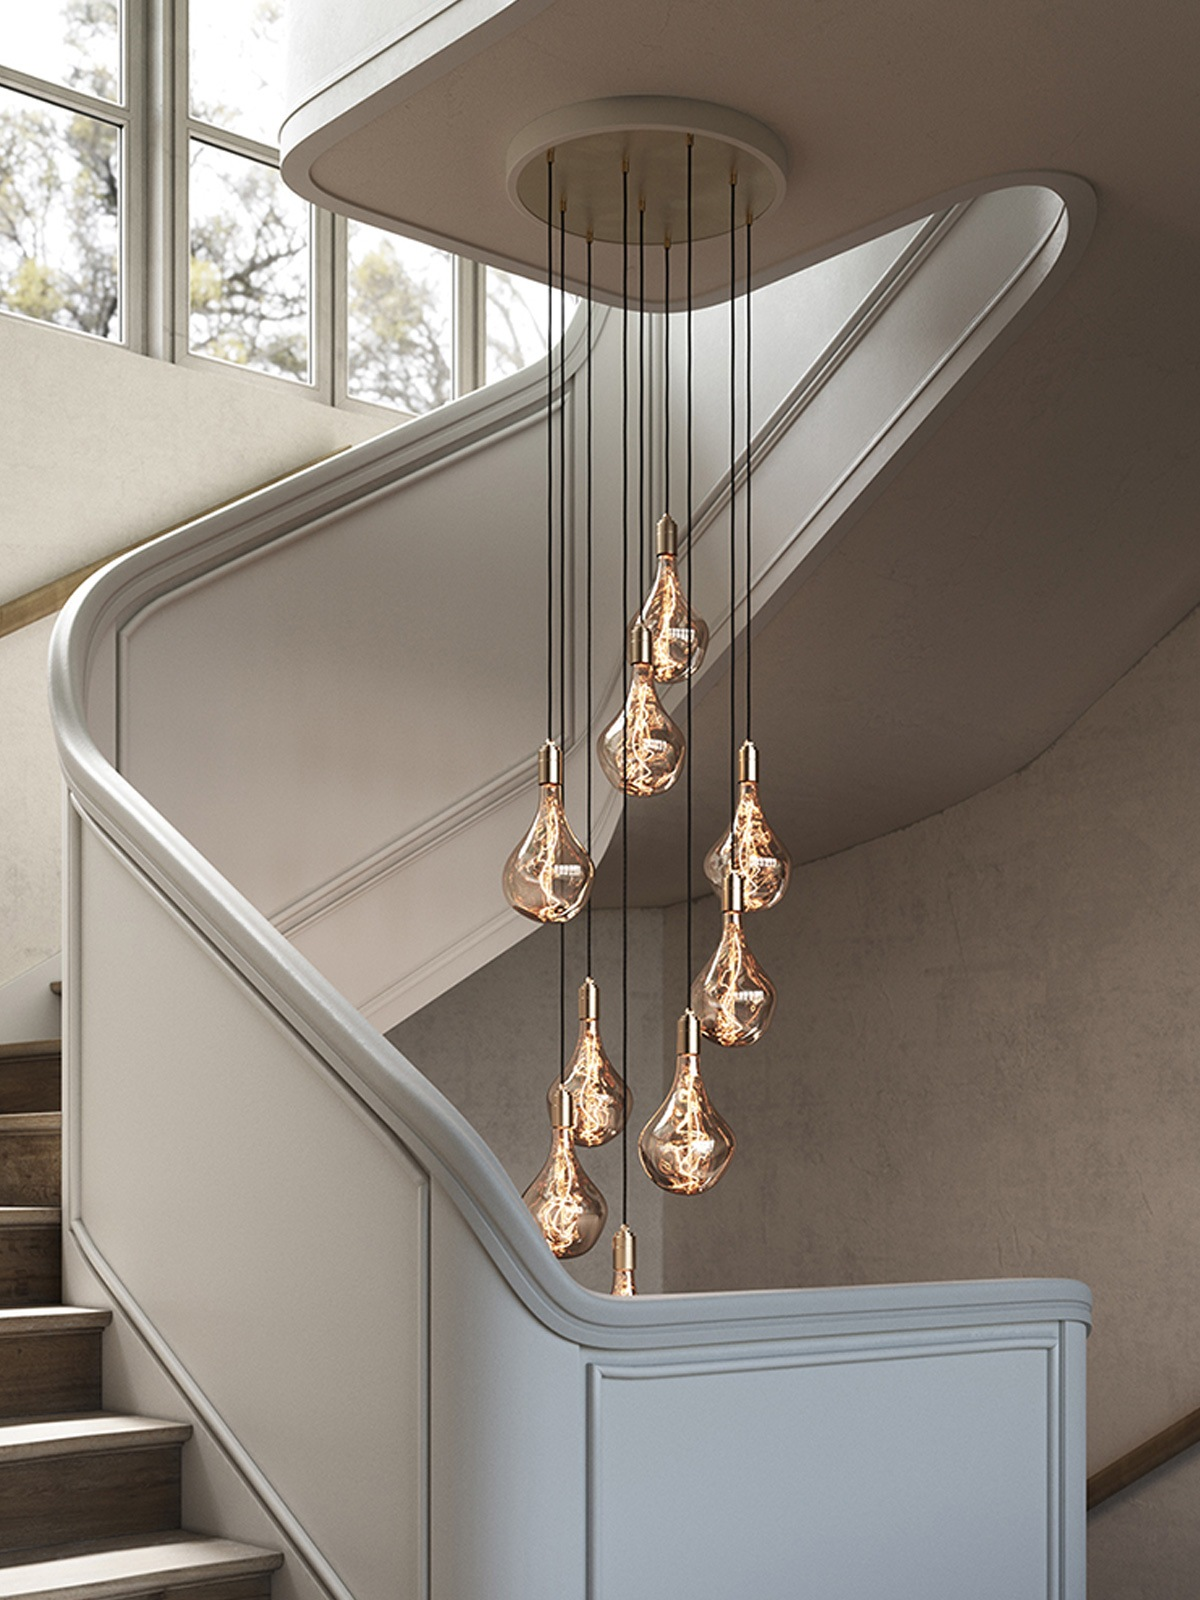 DesignOrt Blog: Exklusive Designerleuchten - Nine Pendant Large Canopy Tala Cluster neunflammige Pendelleuchte DesignOrt Lampen Onlineshop Berlin